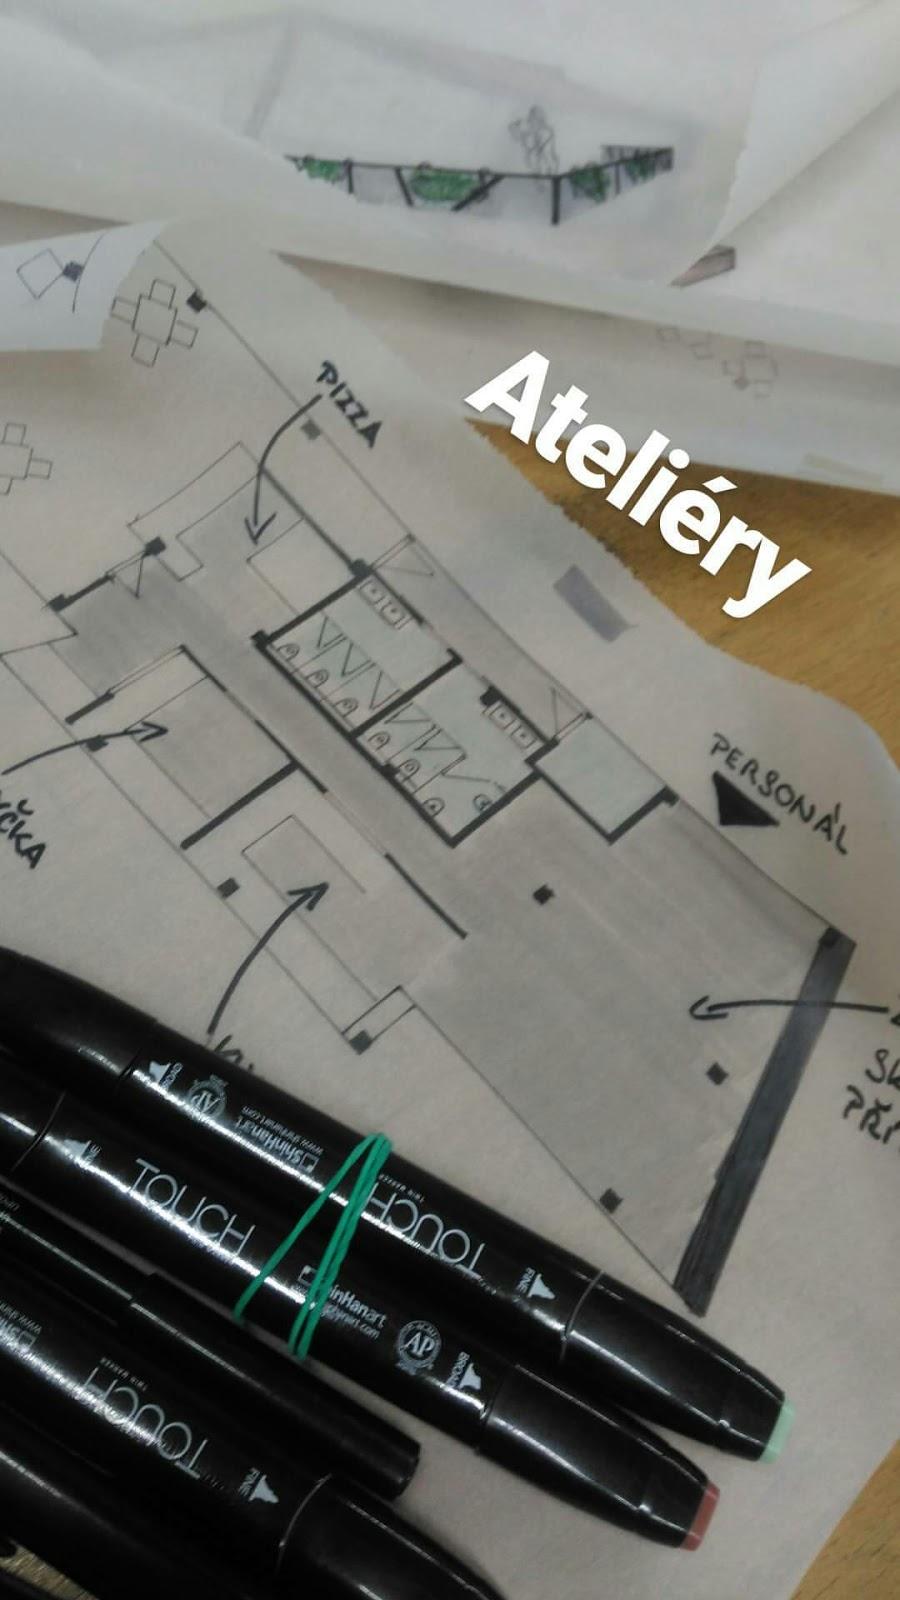 Jak Narocne Je Studium Architektury Na Cvut Ivush